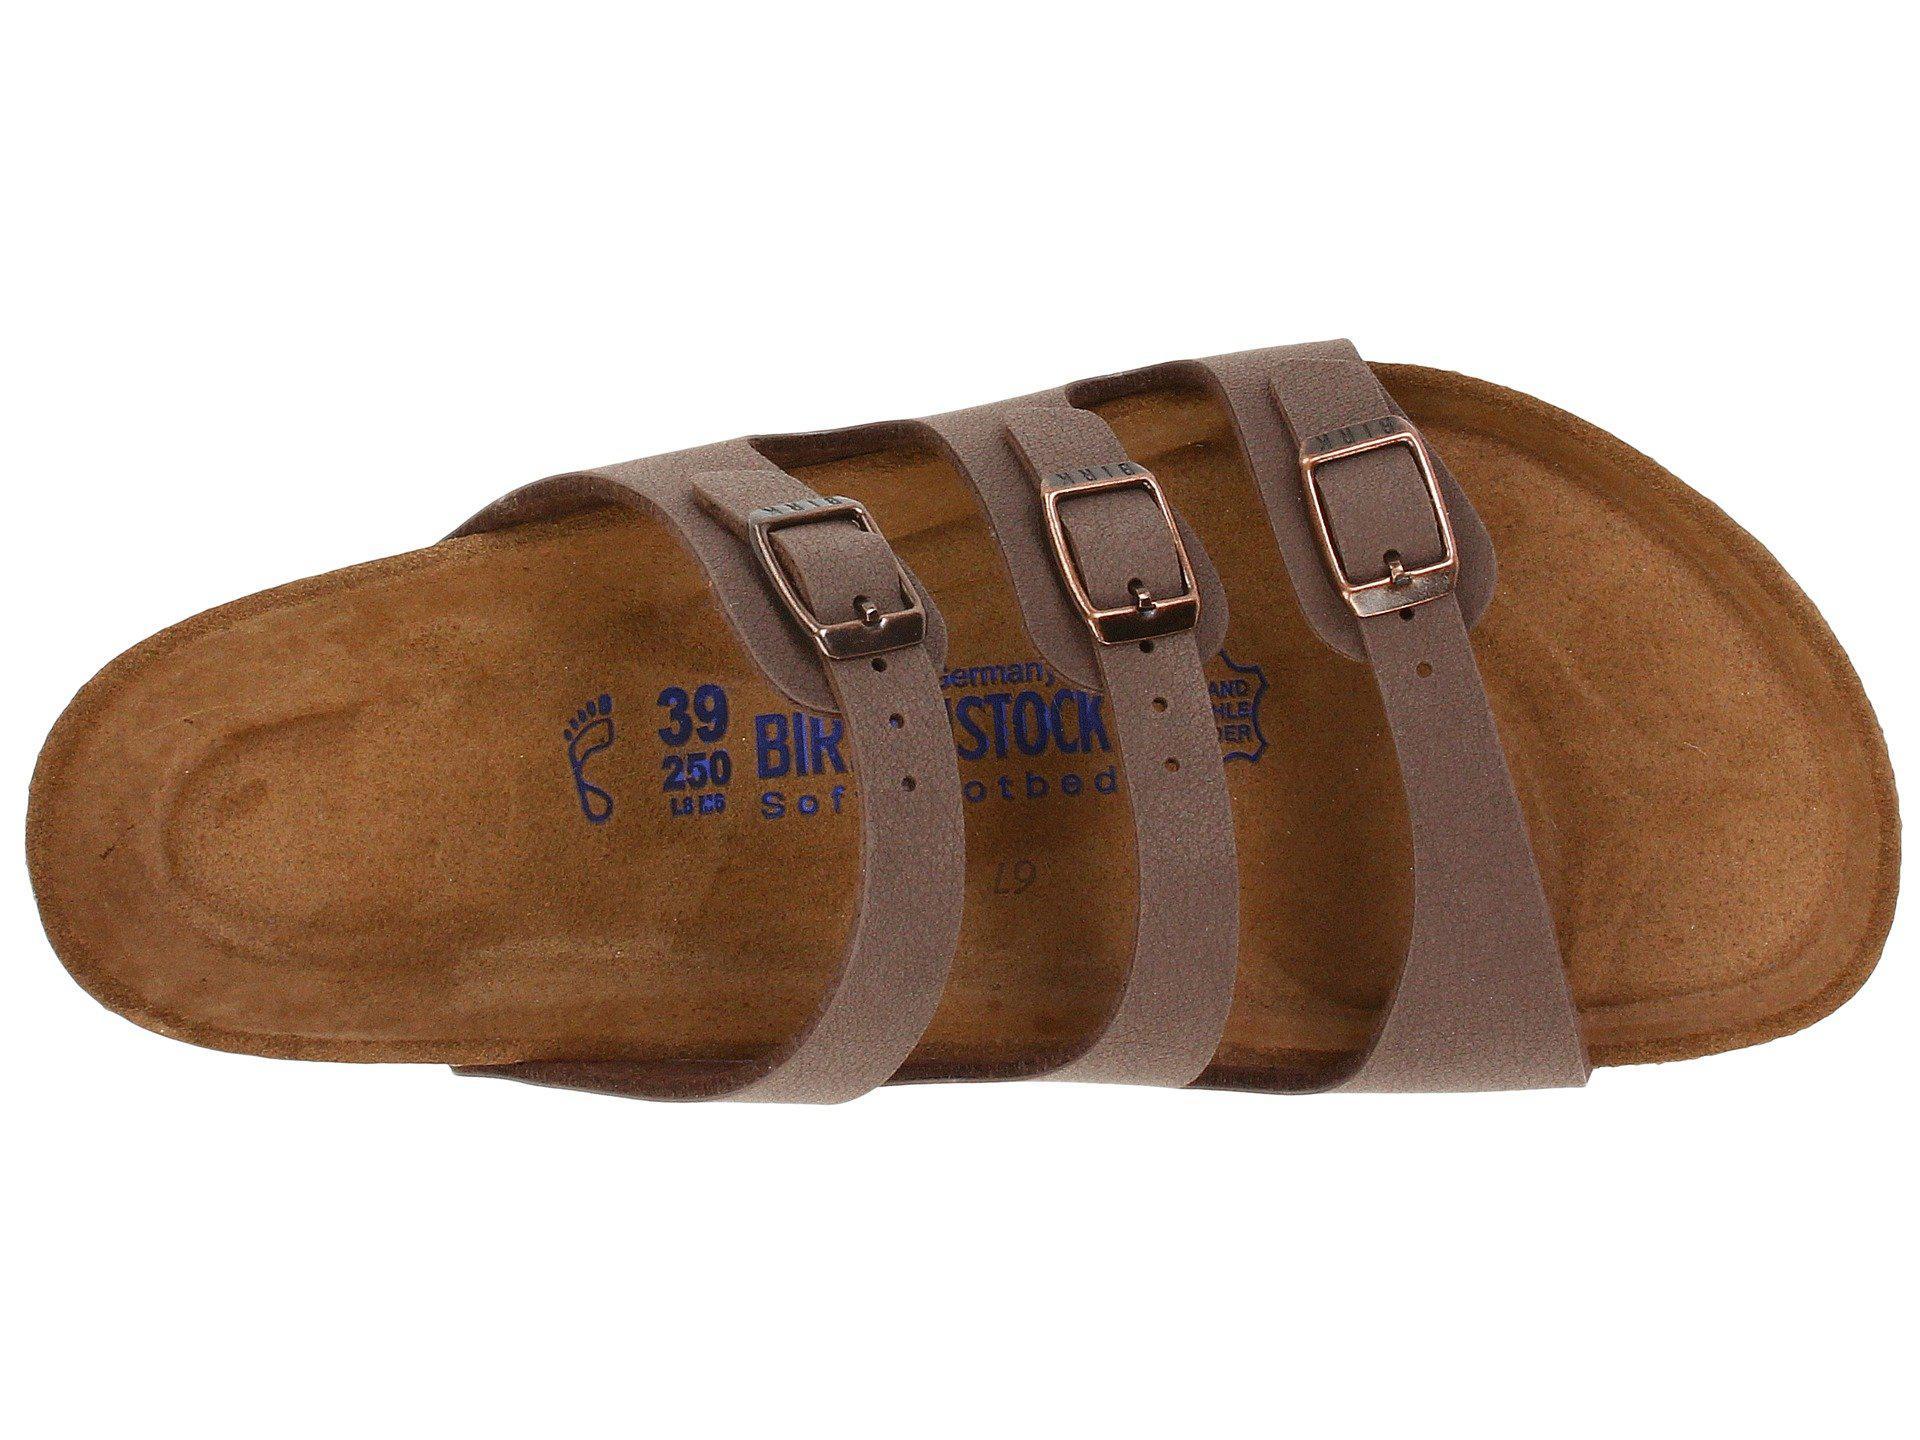 7edb6e0e942 Birkenstock - Brown Florida Soft Footbed - Birkibuc (mocha Birkibuc)  Women s Sandals - Lyst. View fullscreen